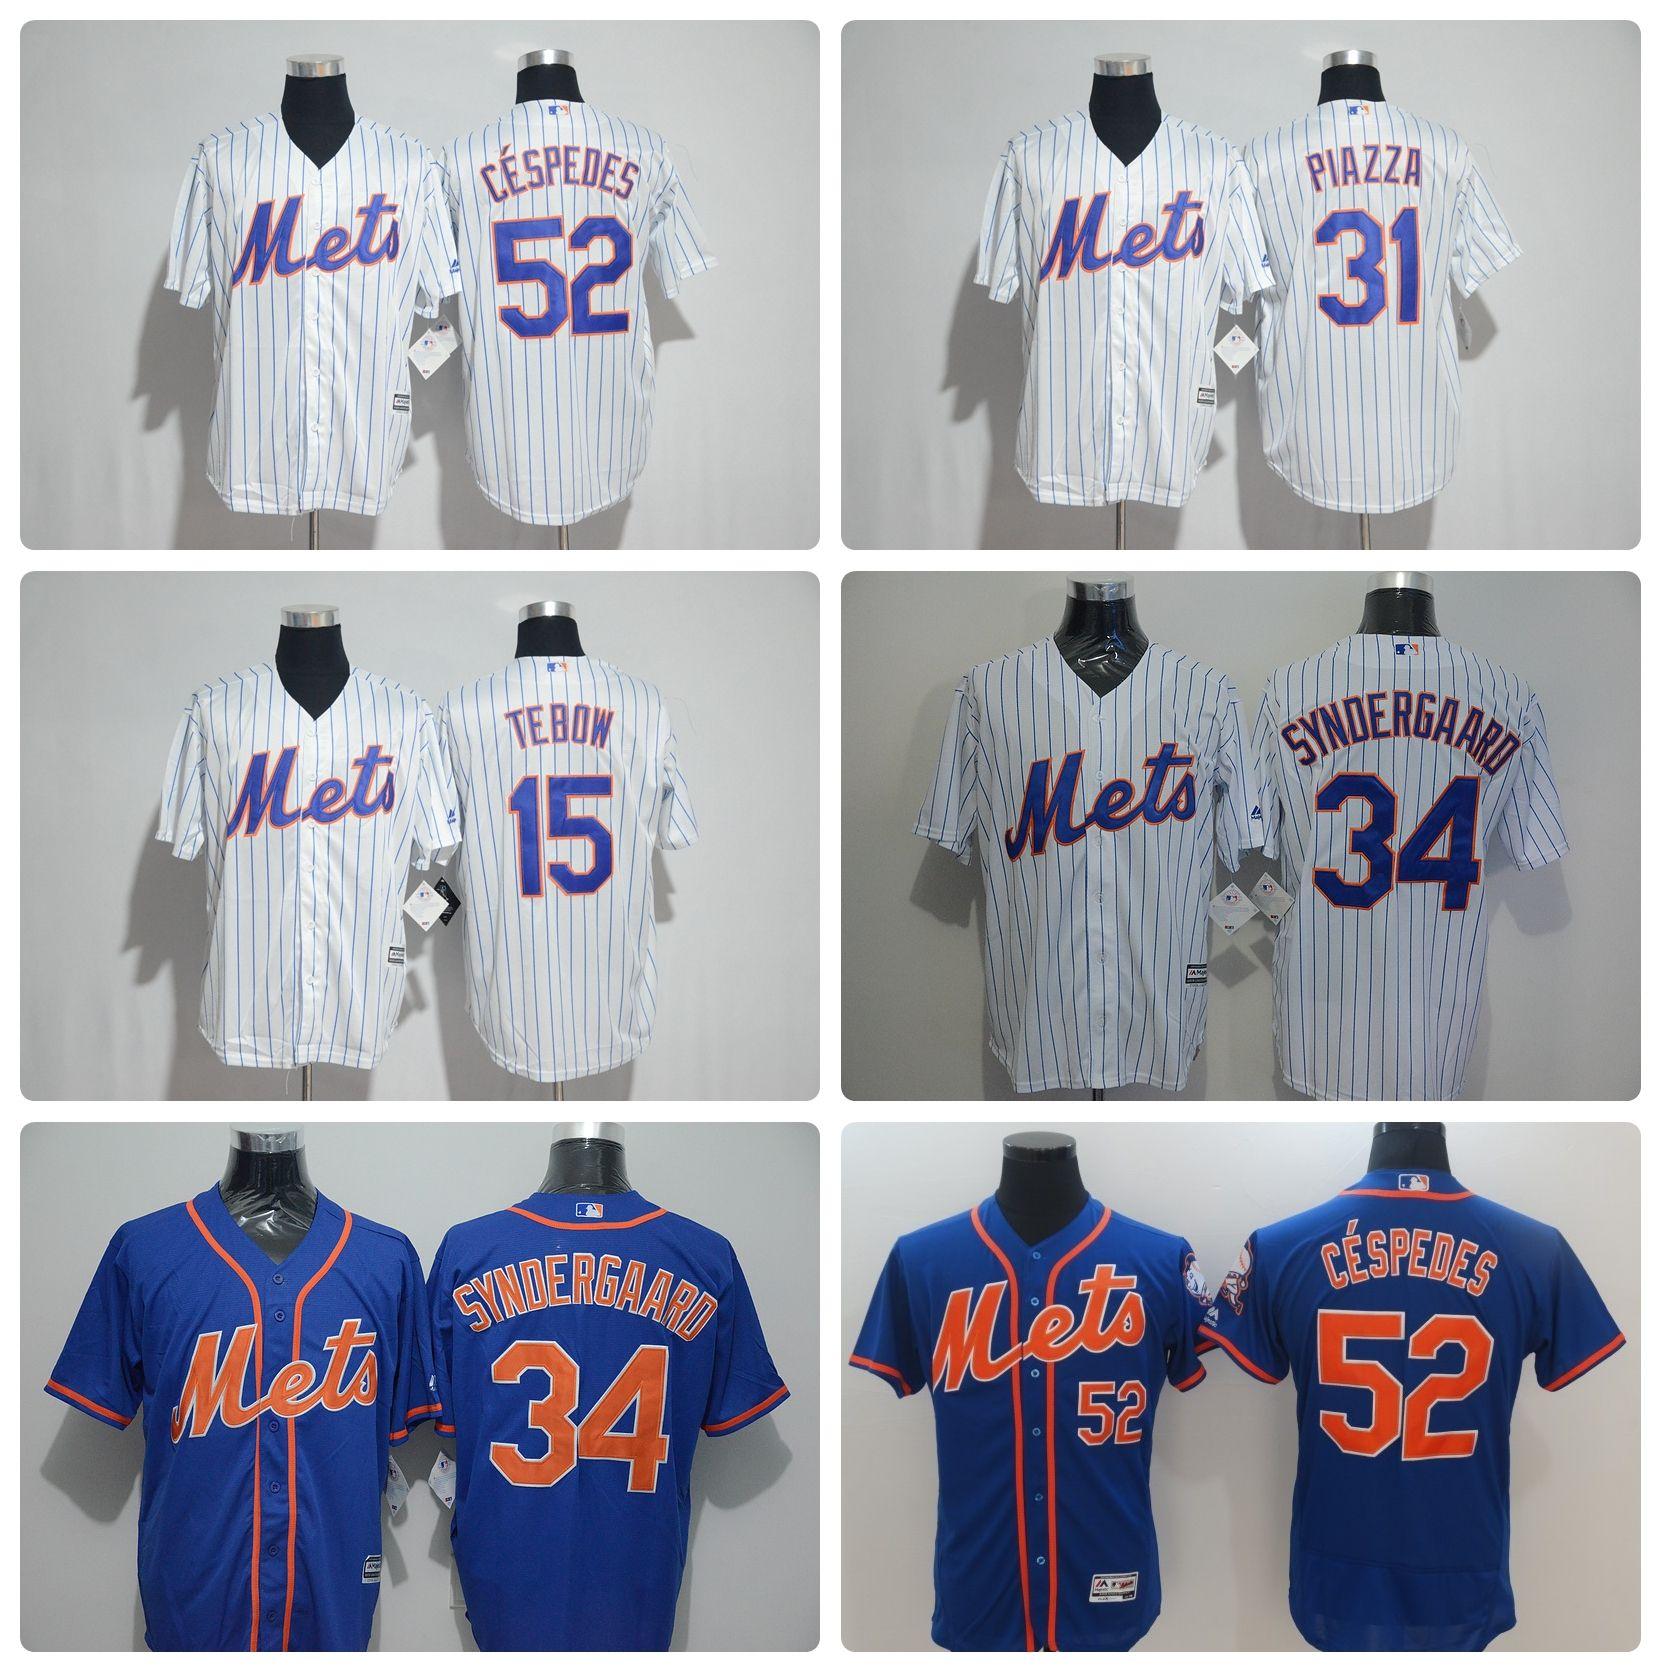 02b675476 2017 Hombres Nueva York Mets 34 Noah Syndergaard 31 Mike Plaza 15 ...